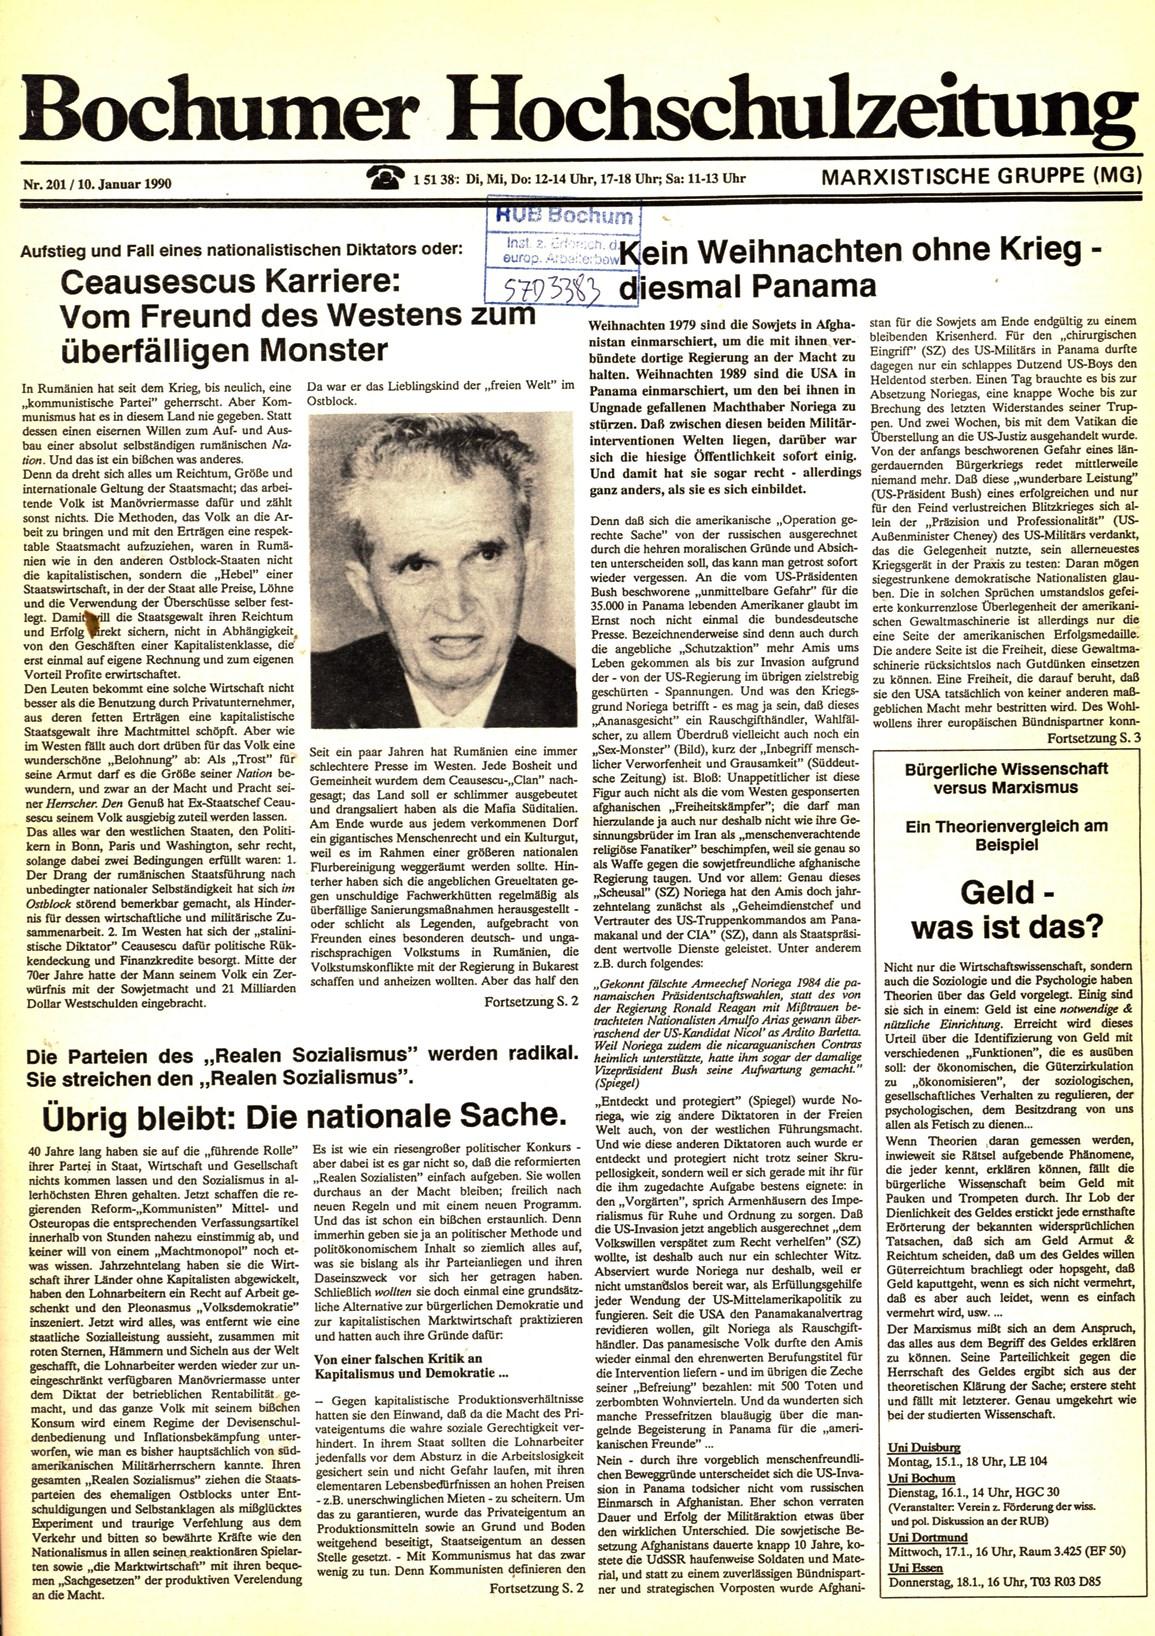 Bochum_BHZ_19900110_201_001